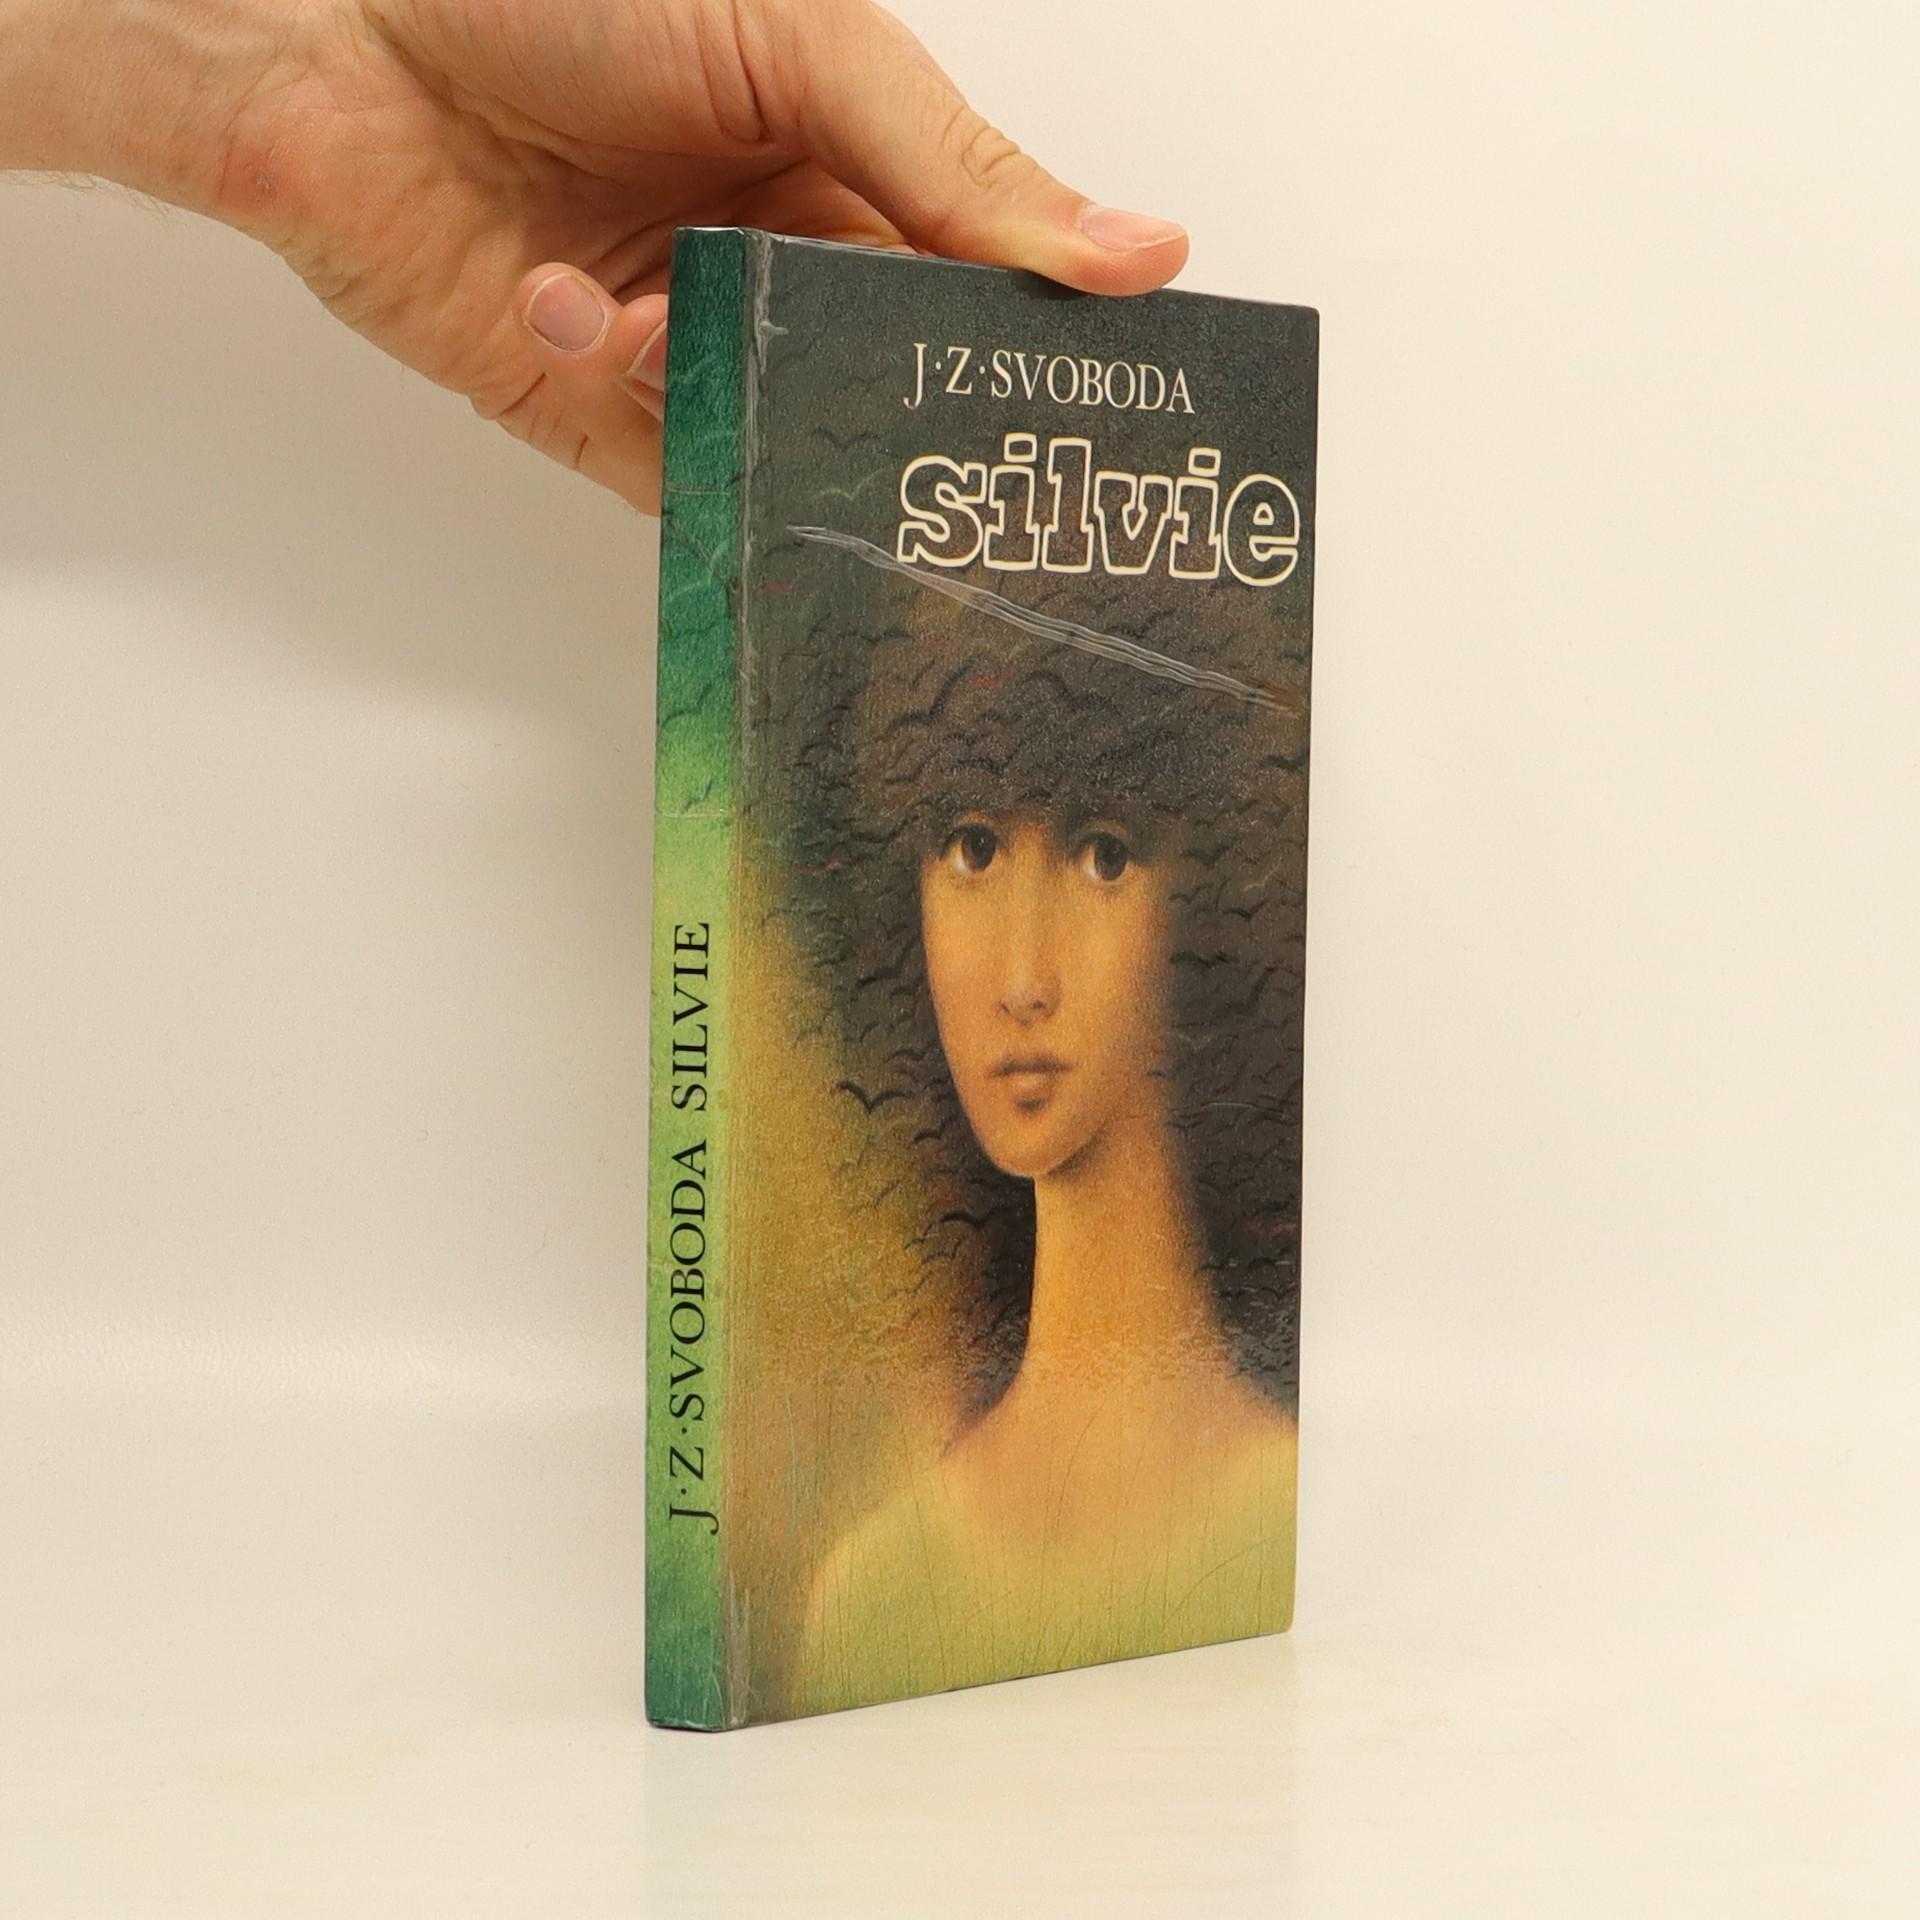 antikvární kniha Silvie, 1984